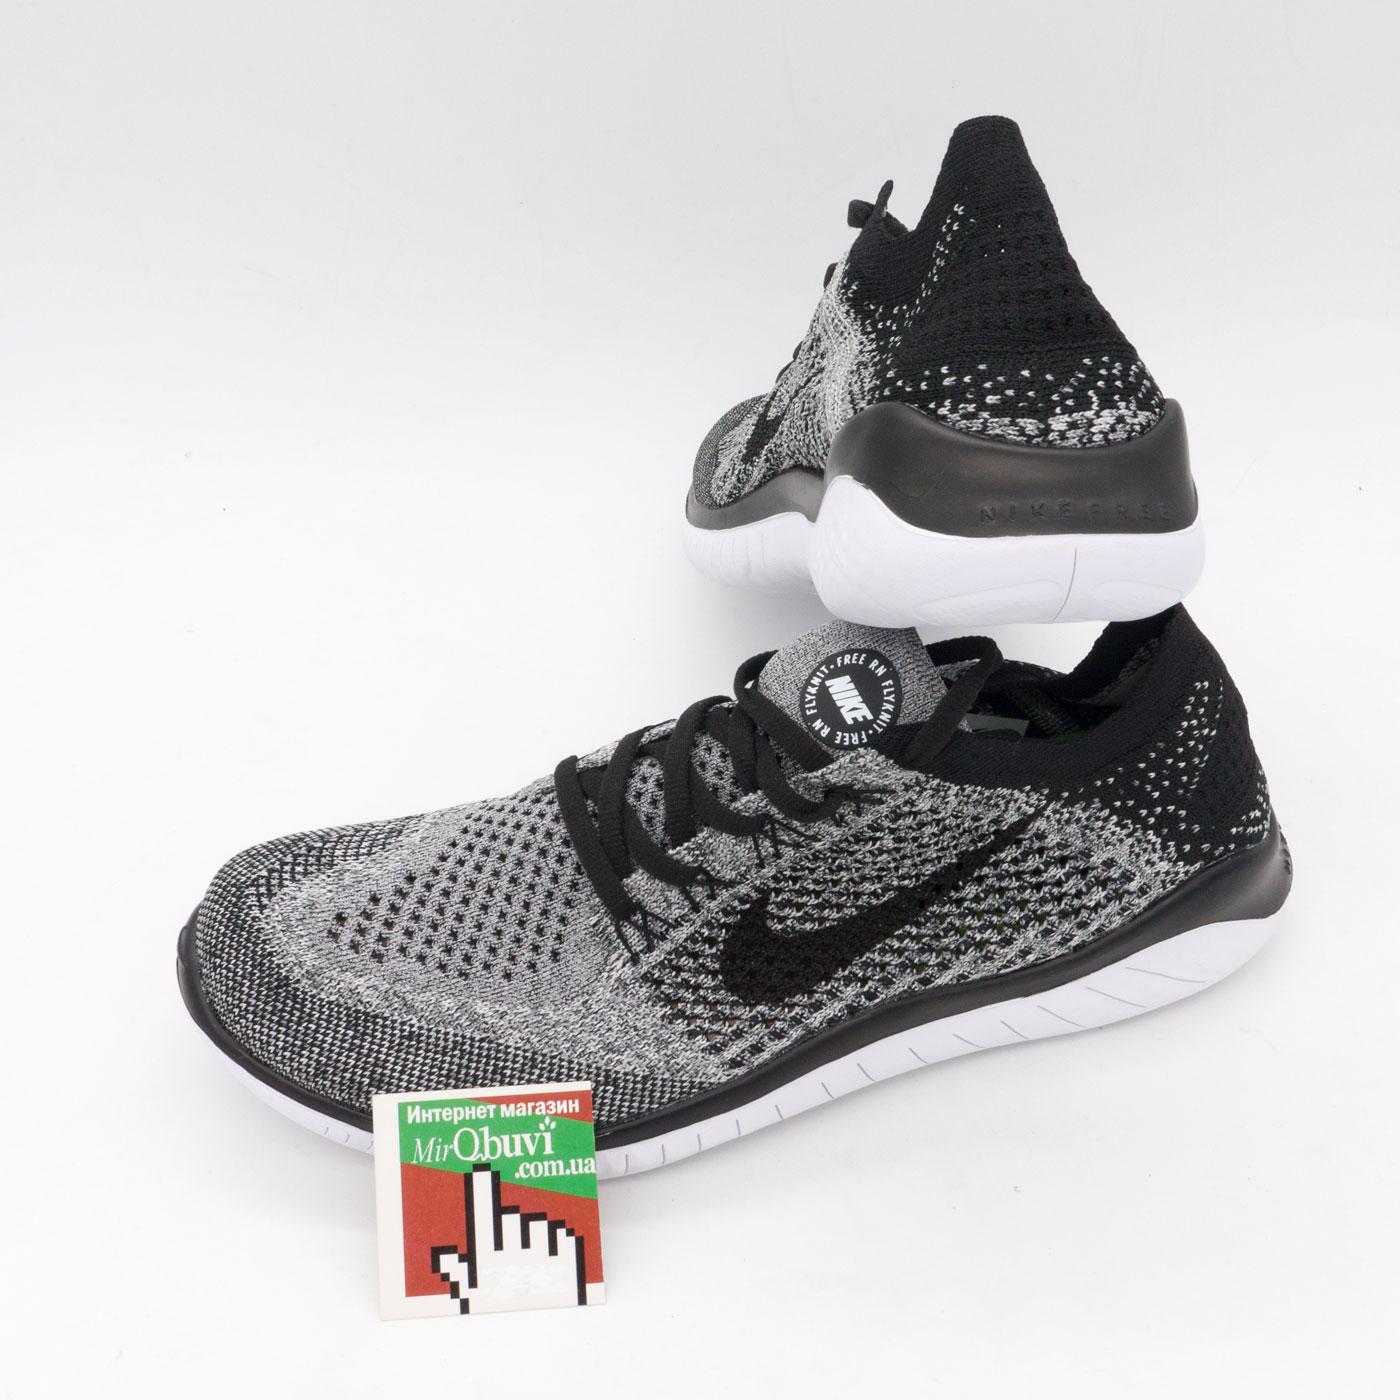 фото front Кроссовки для бега Nike Free Run Flyknit Найк Фри Ран, серые front